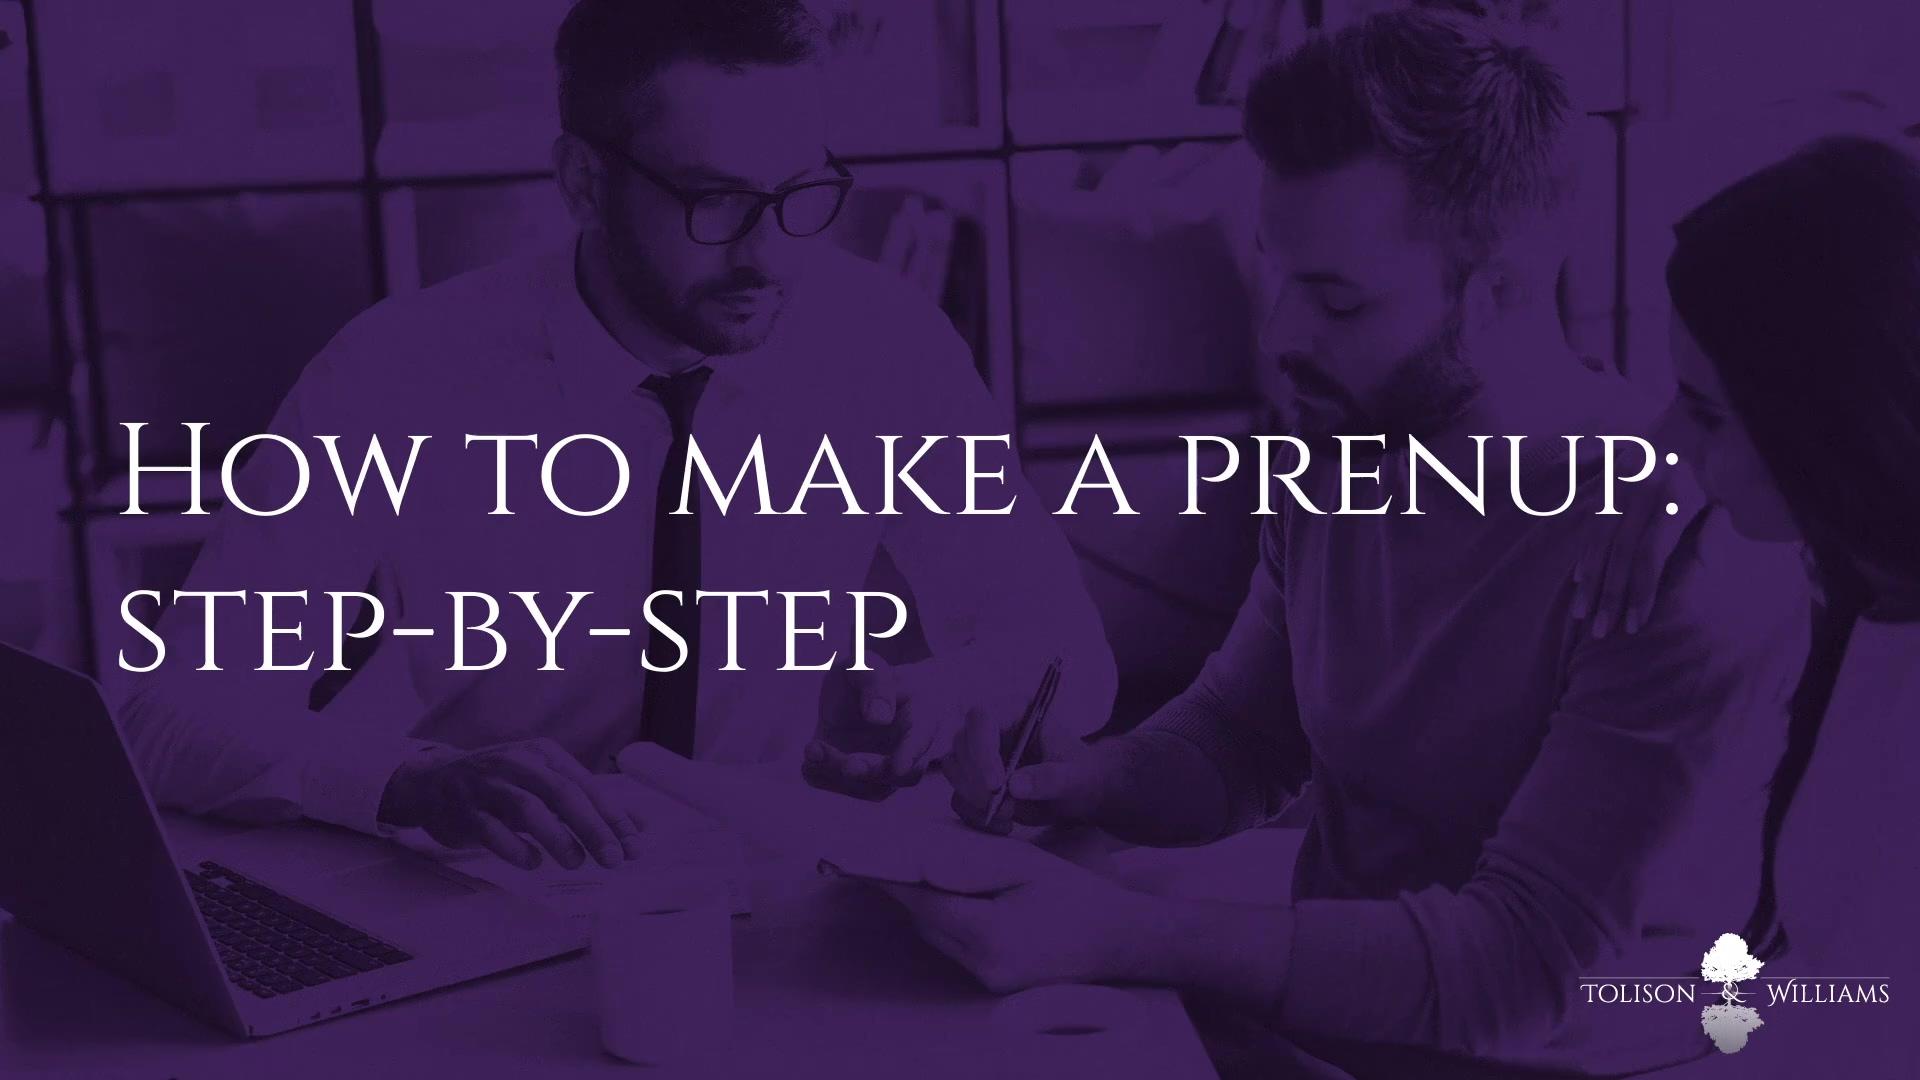 TW-how-to-make-a-prenup-v3